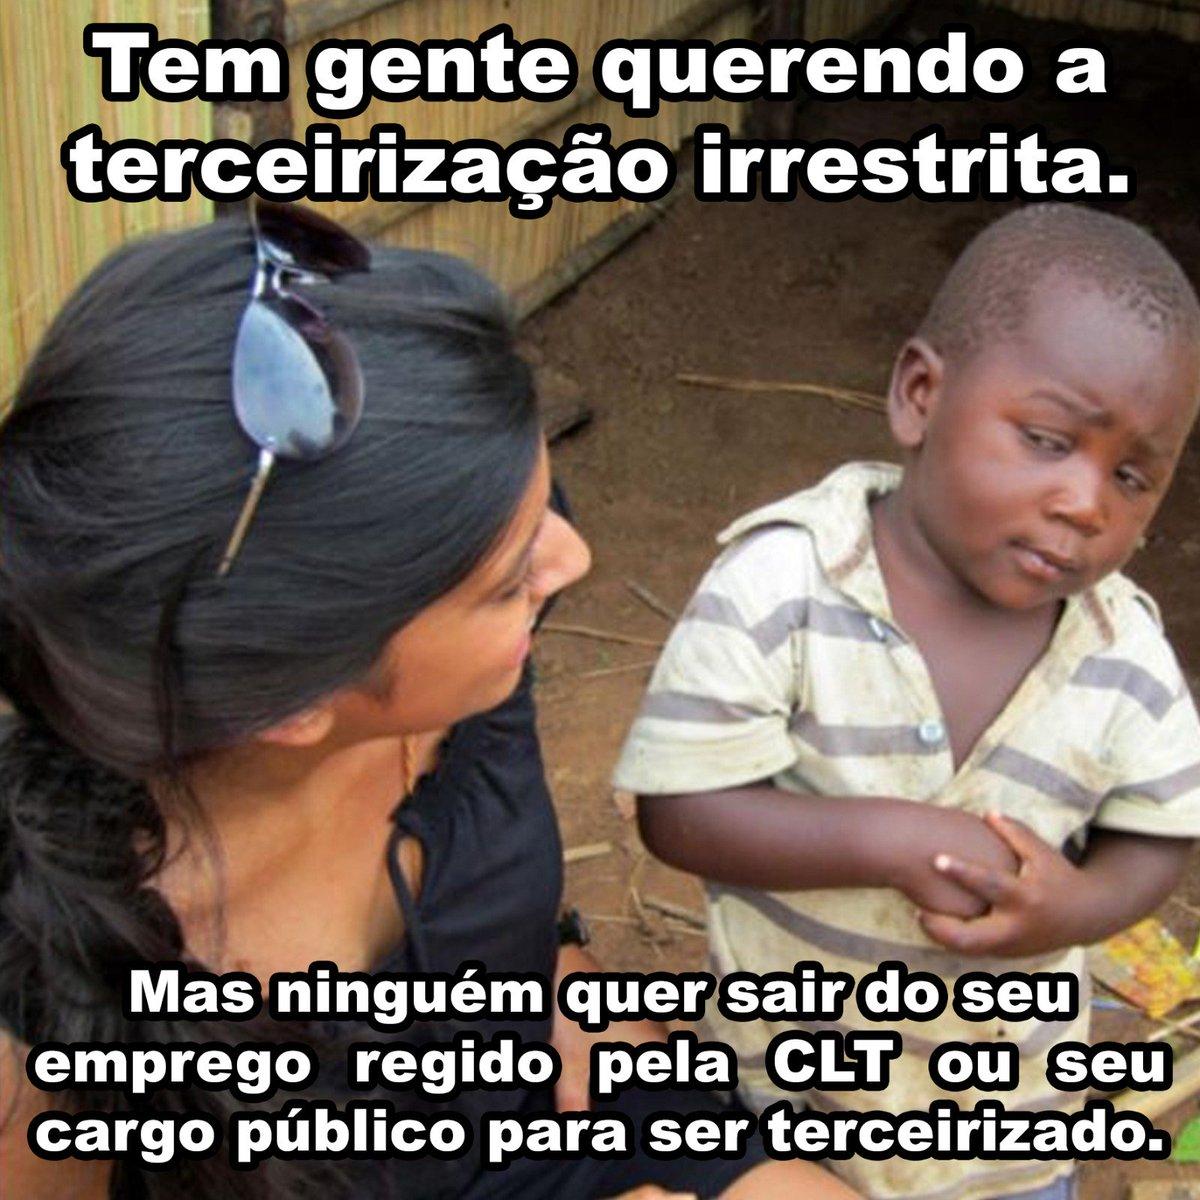 🤔#terceirização https://t.co/K5Xcv1tGfy